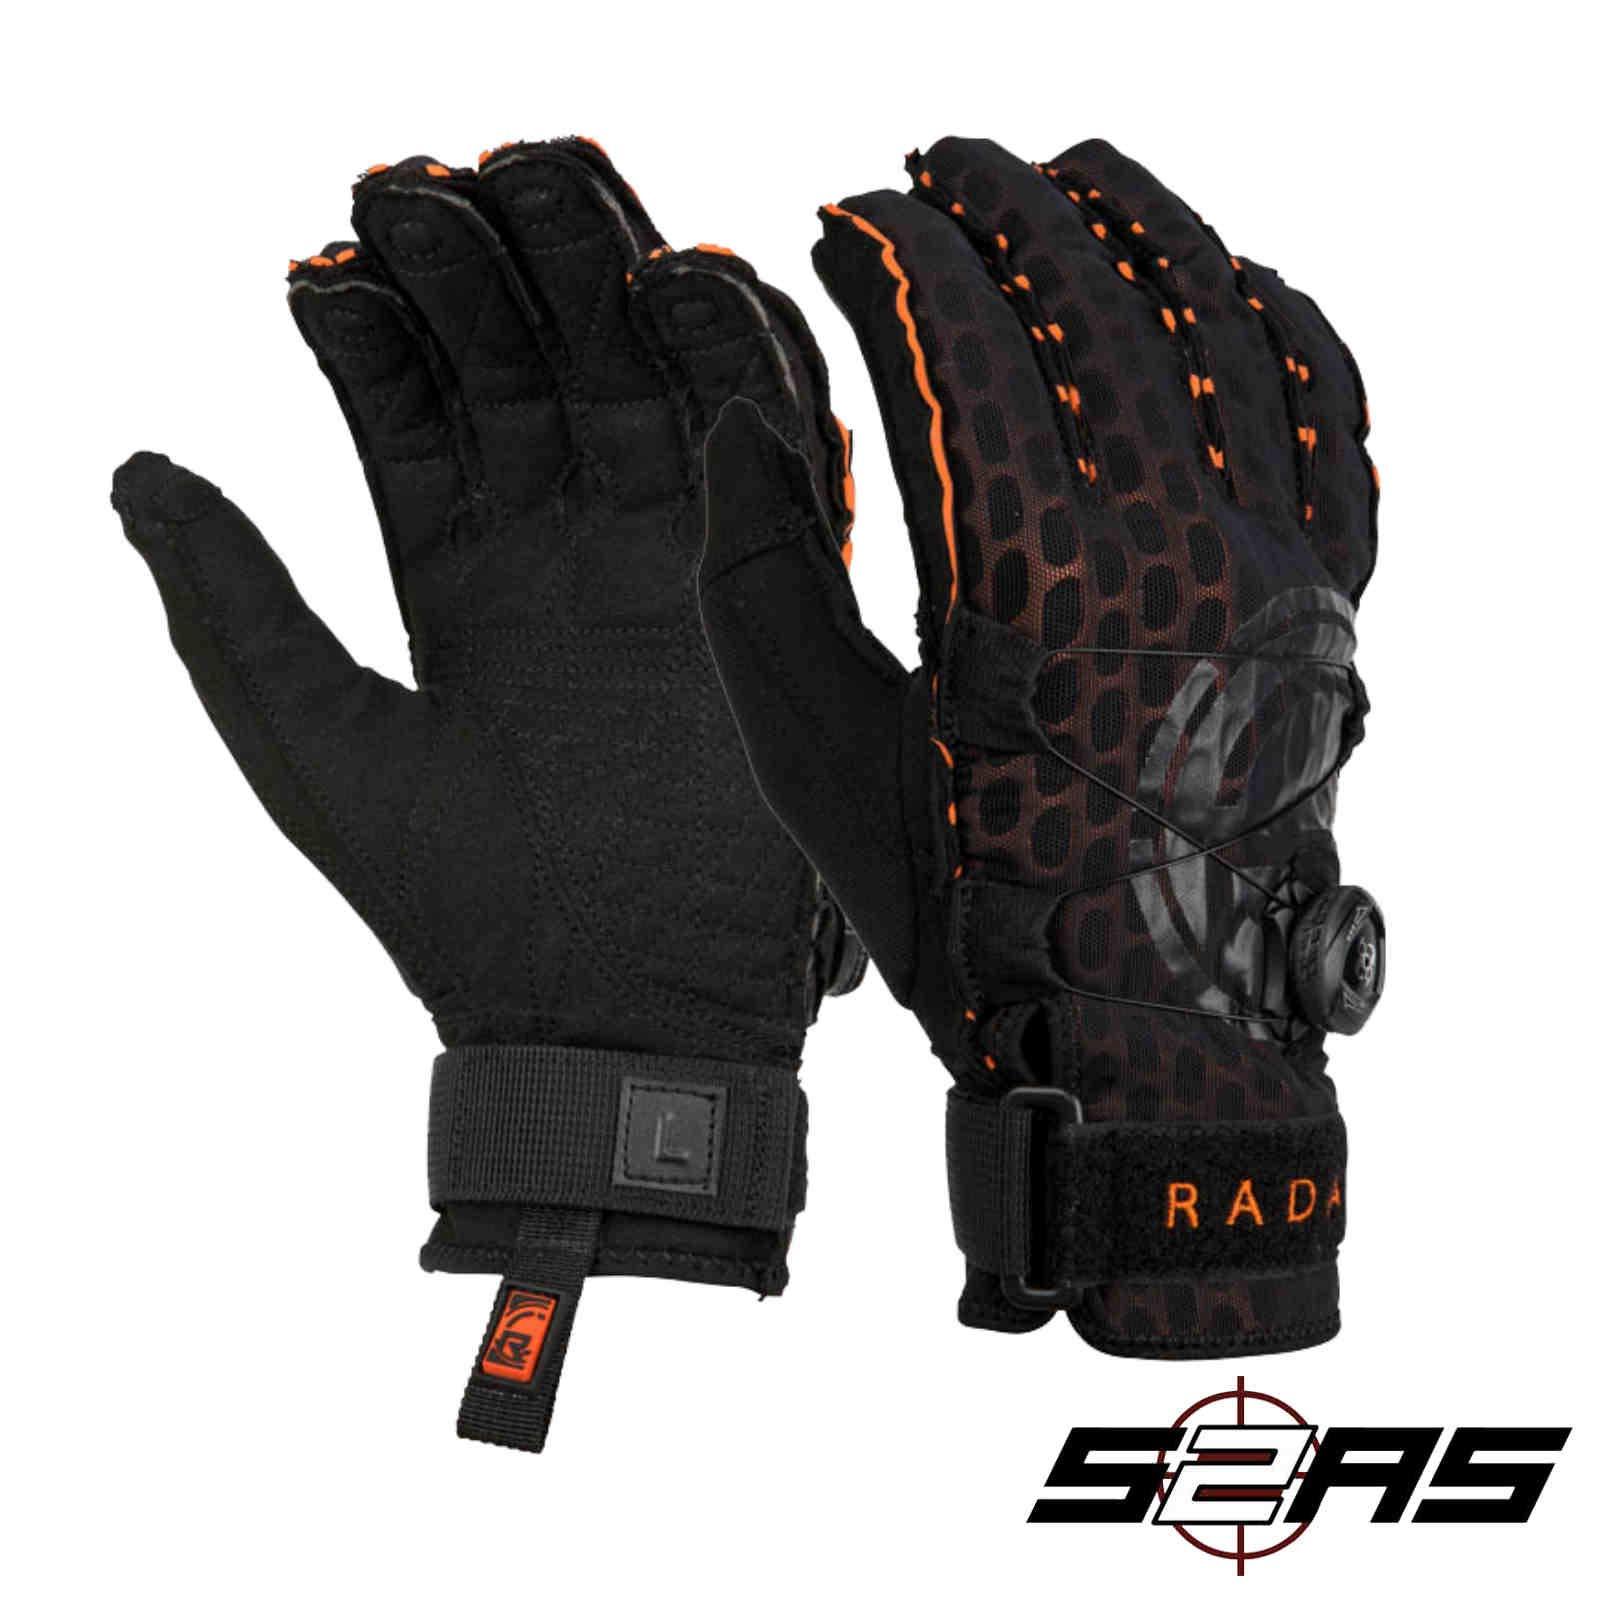 Radar Vapor A - BOA - Inside-Out Glove - Black/Orange Ariaprene - XL